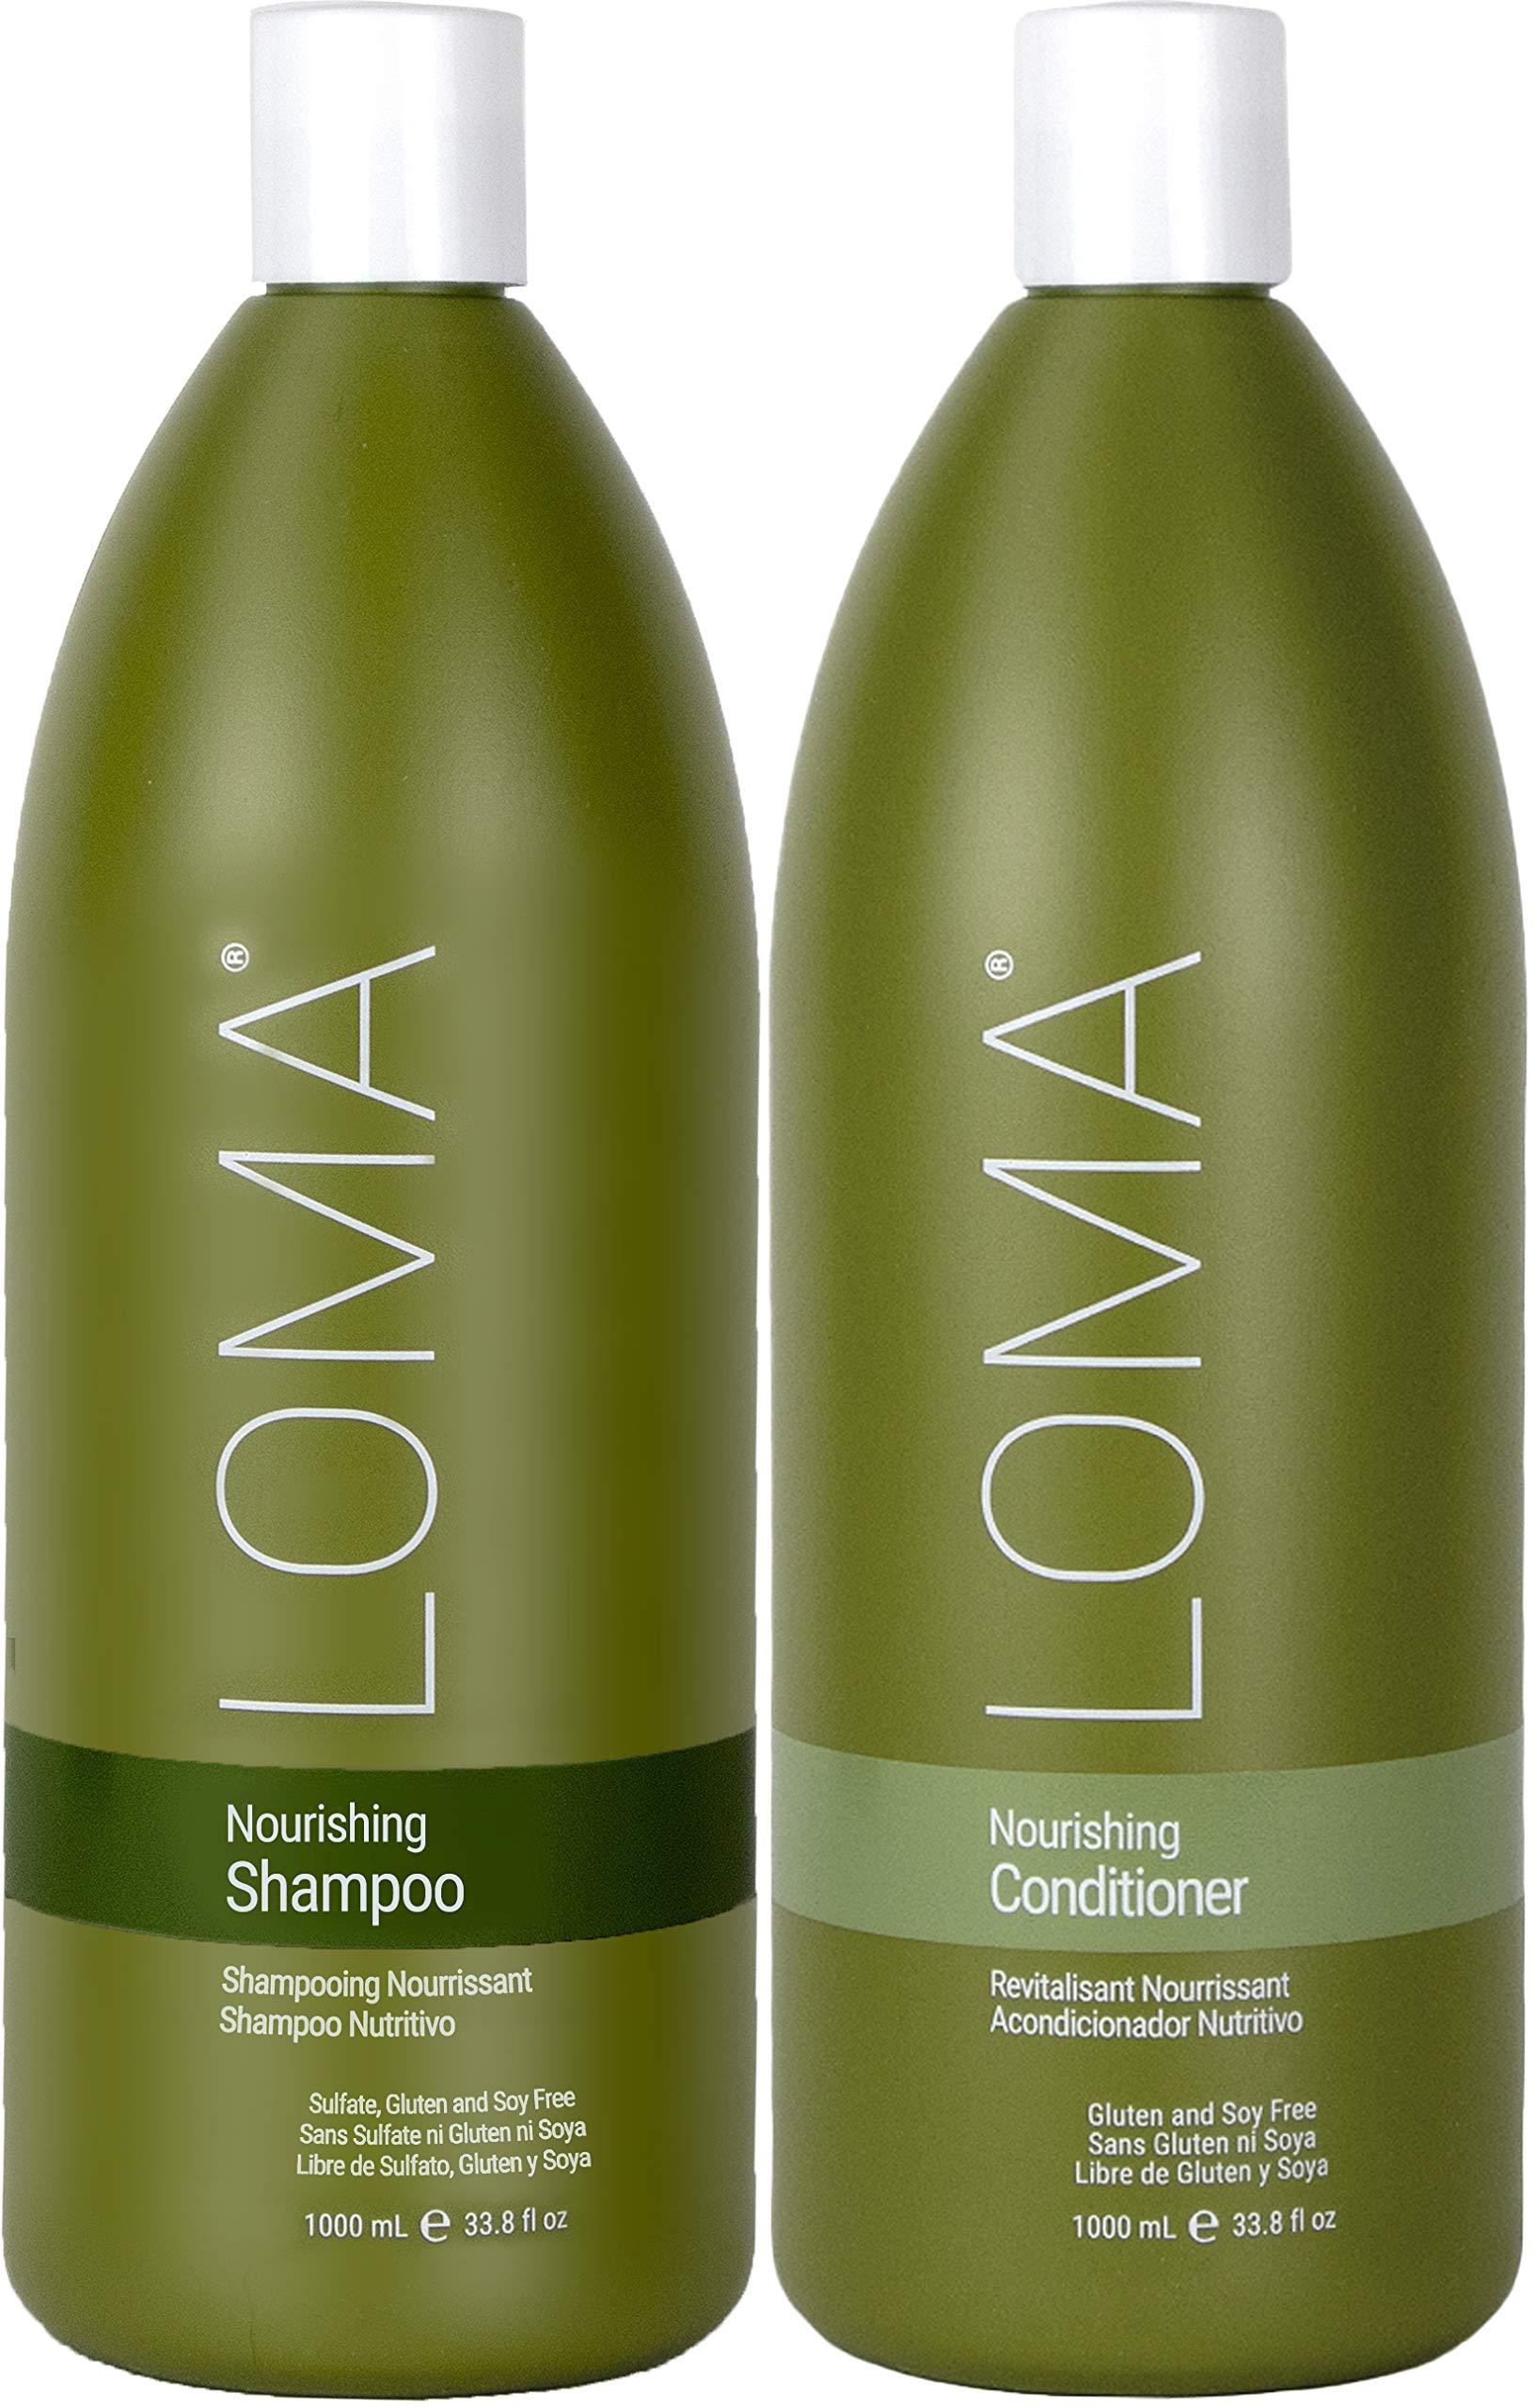 Loma Hair Care Nourishing Shampoo Nourishing Conditioner Duo, 33 oz.